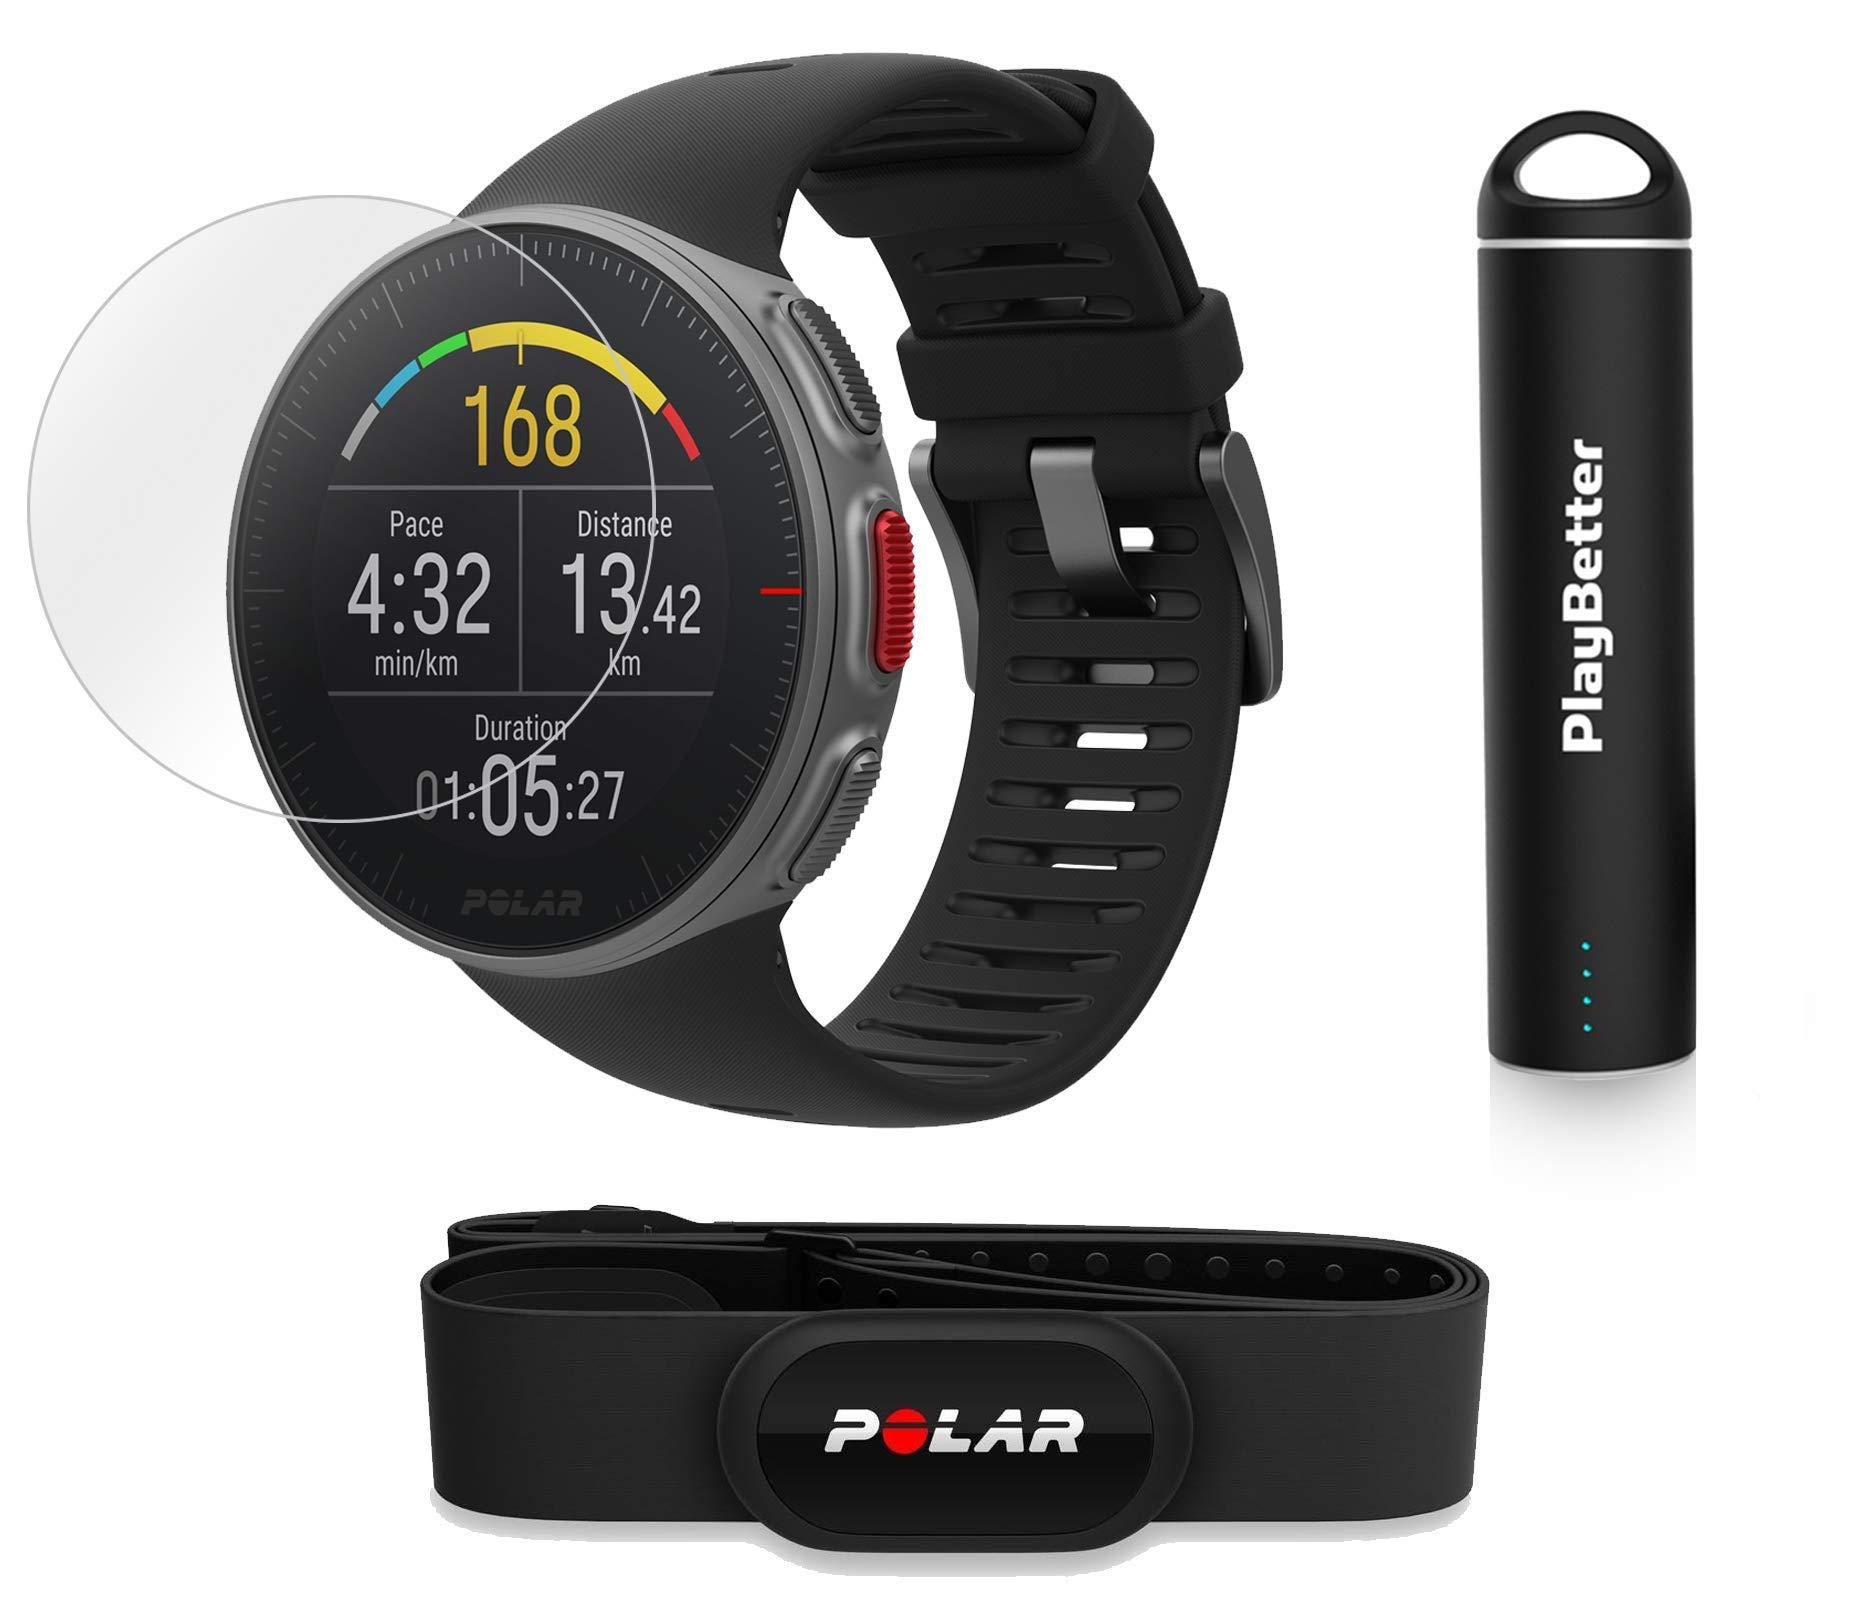 PlayBetter Polar Vantage V Pro (Black with H10 Heart Rate Sensor) Power Bundle Portable Charger & Screen Protectors | Multisport Watch | GPS & Barometer